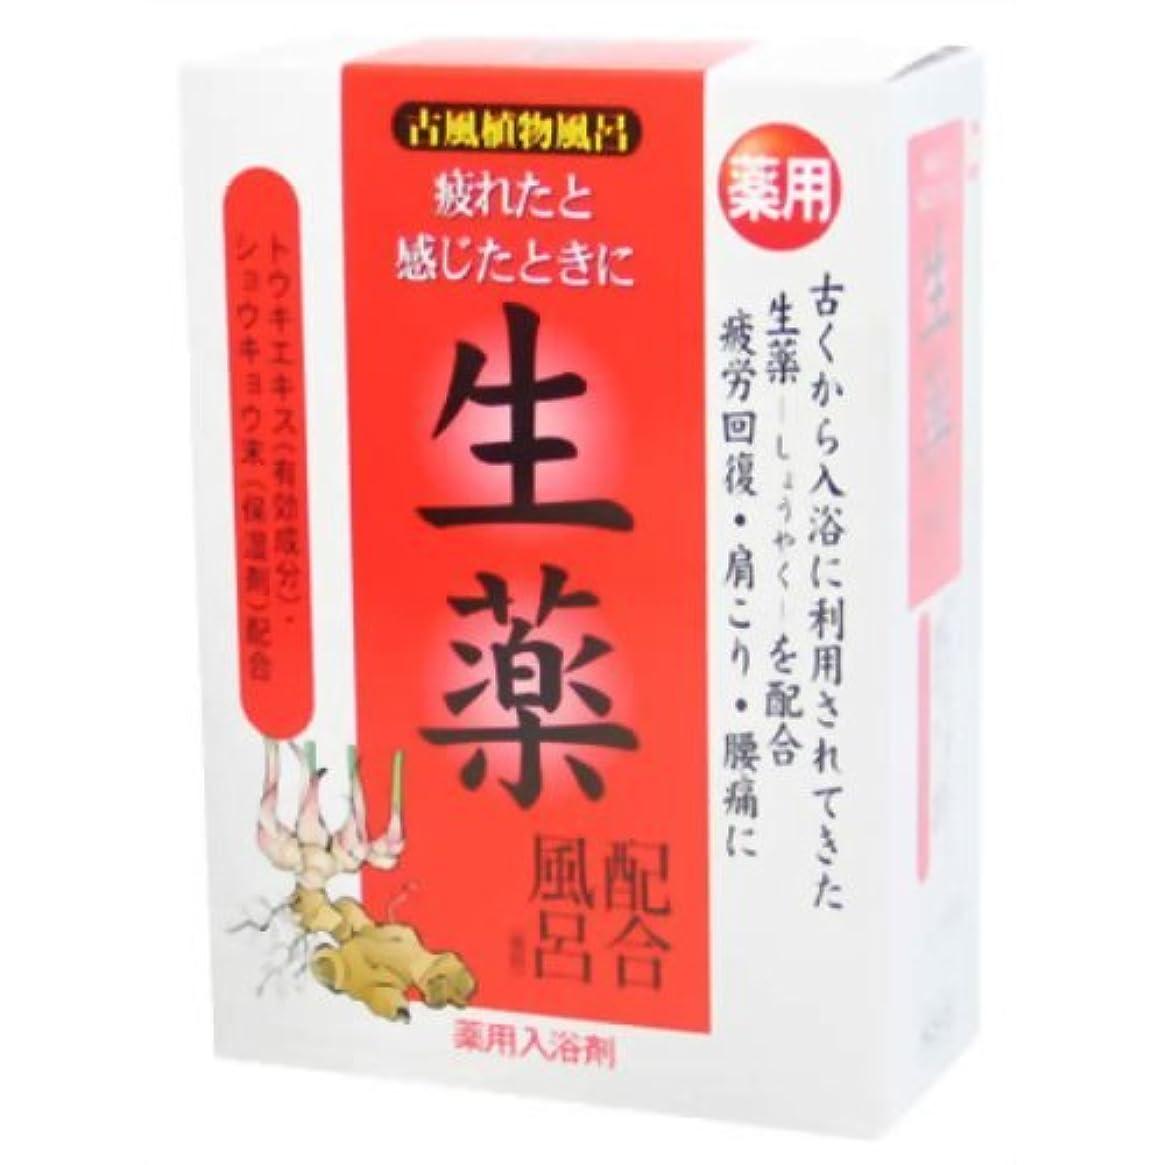 八暴力的な有効な古風植物風呂 生薬配合風呂 25g*5包(入浴剤)